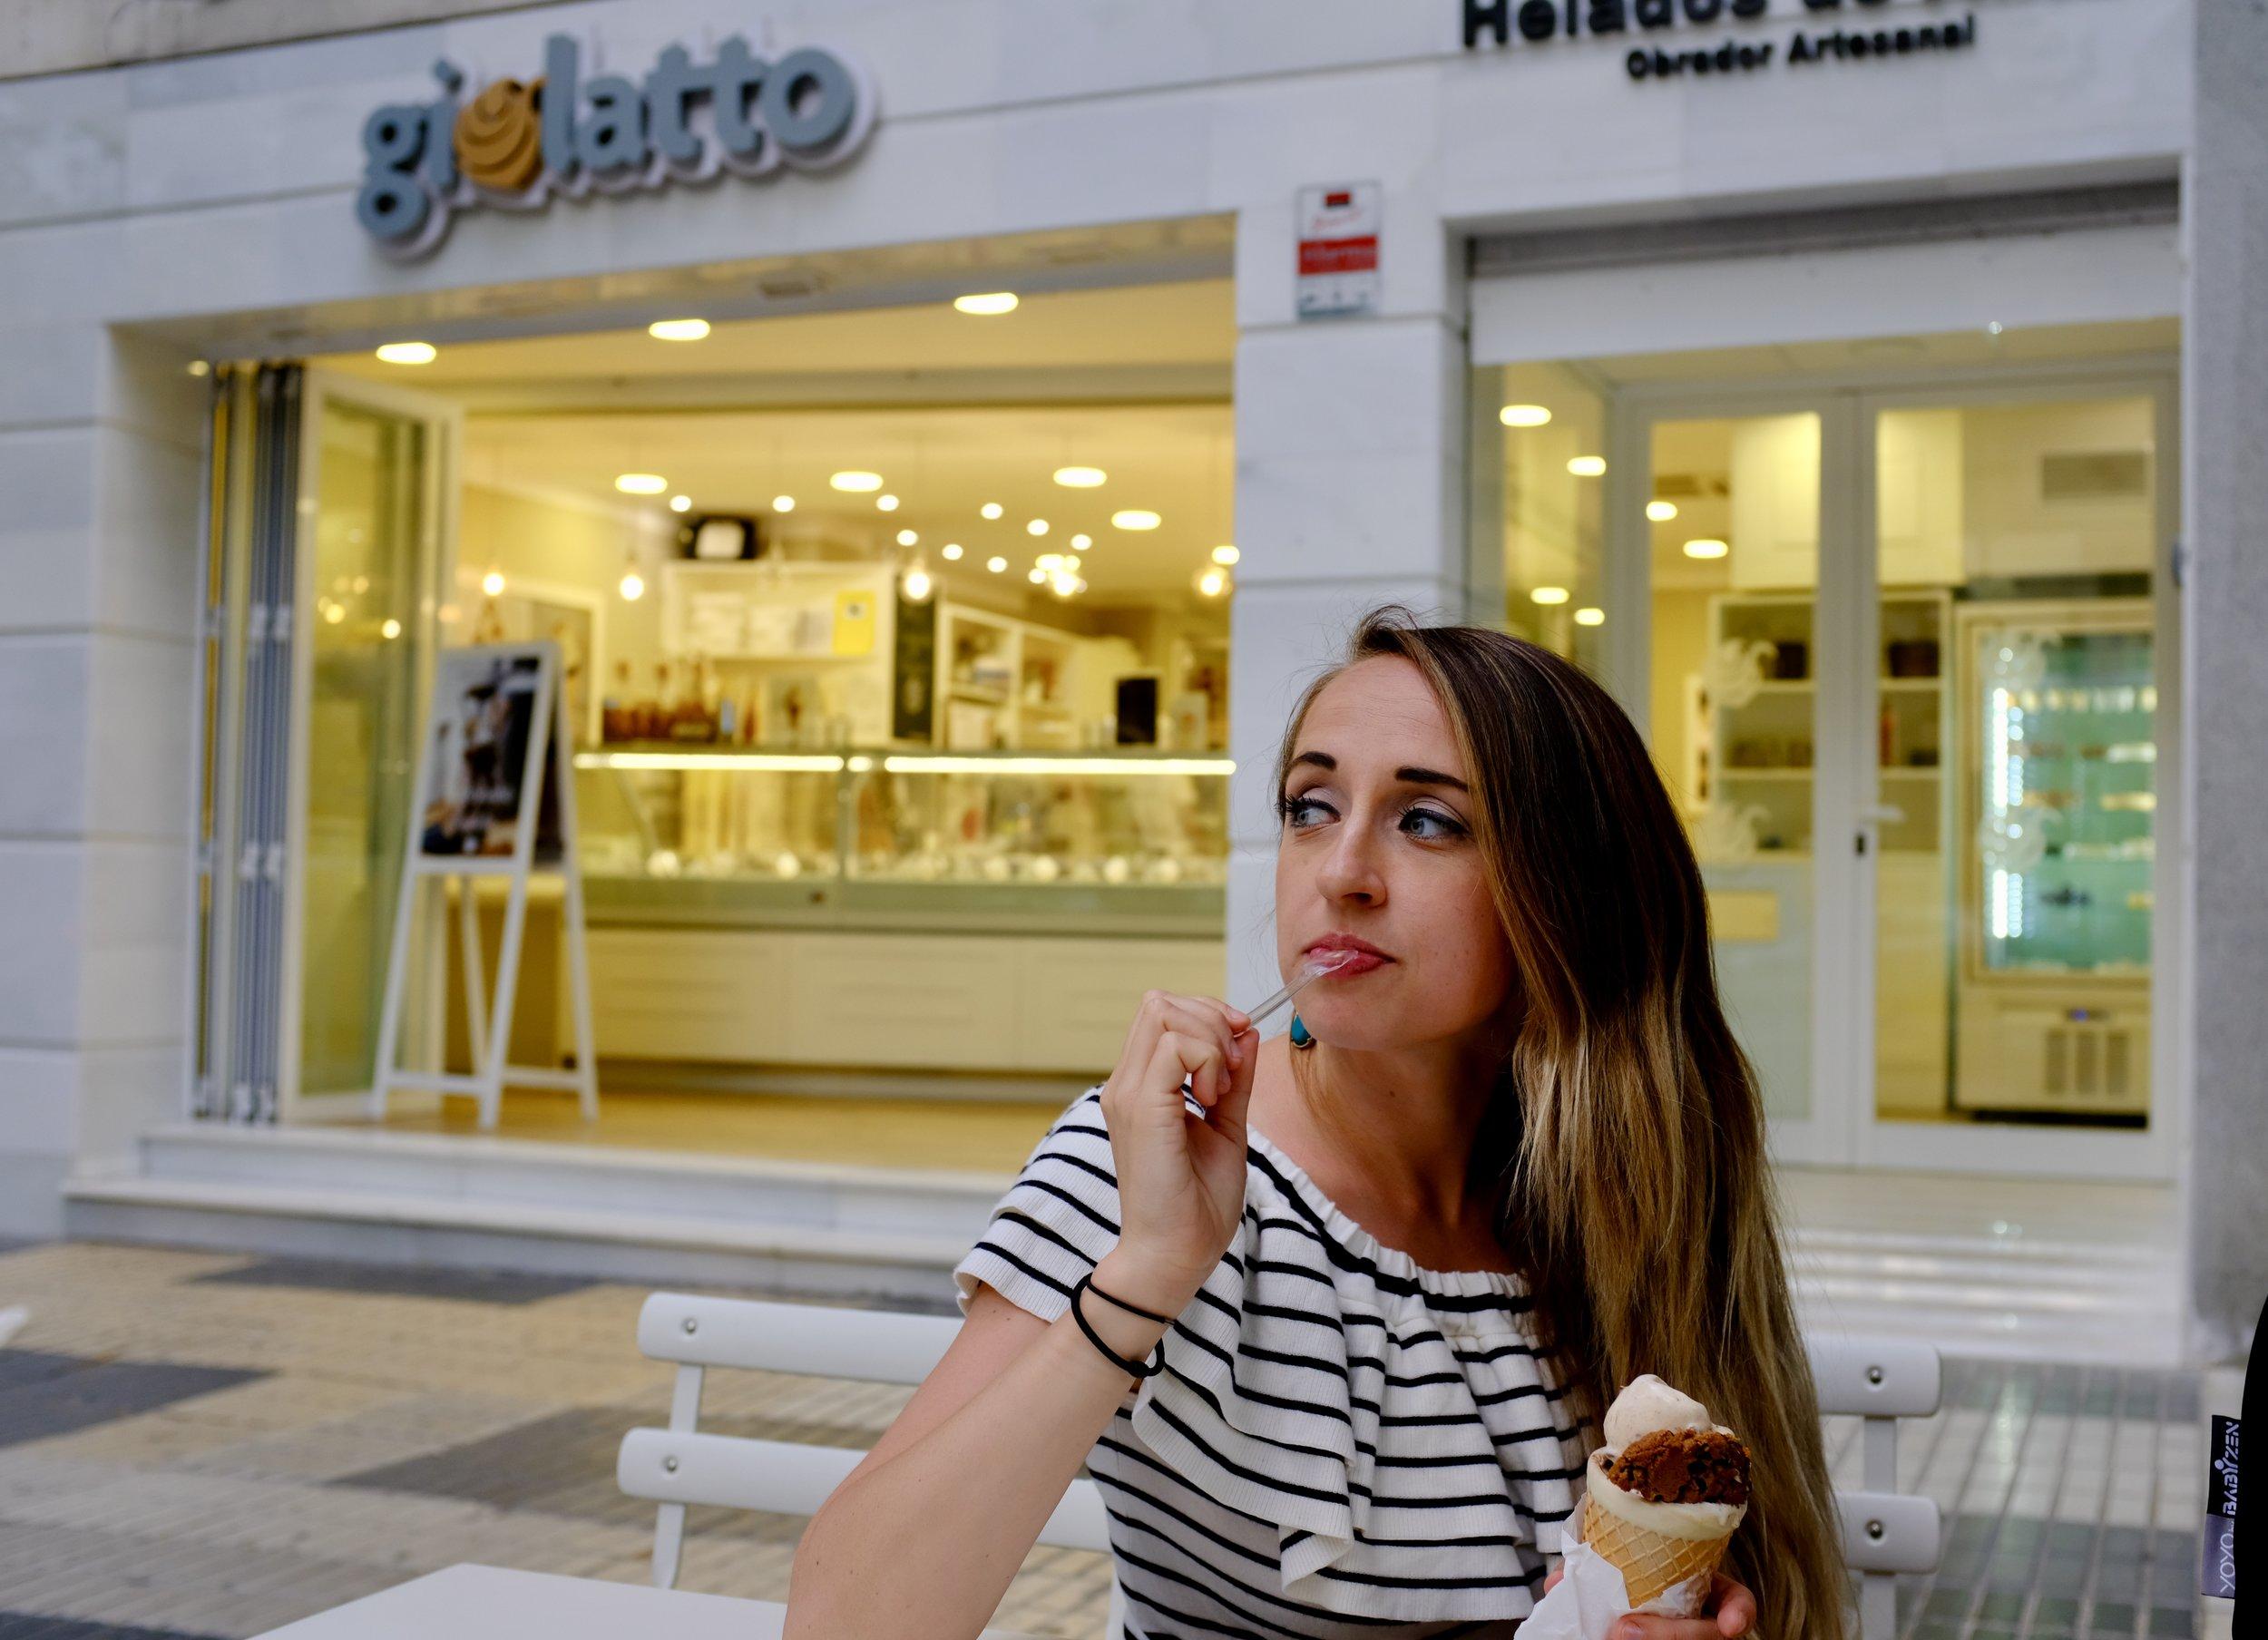 Giolatto Ice Cream_City Nibbler_Seville